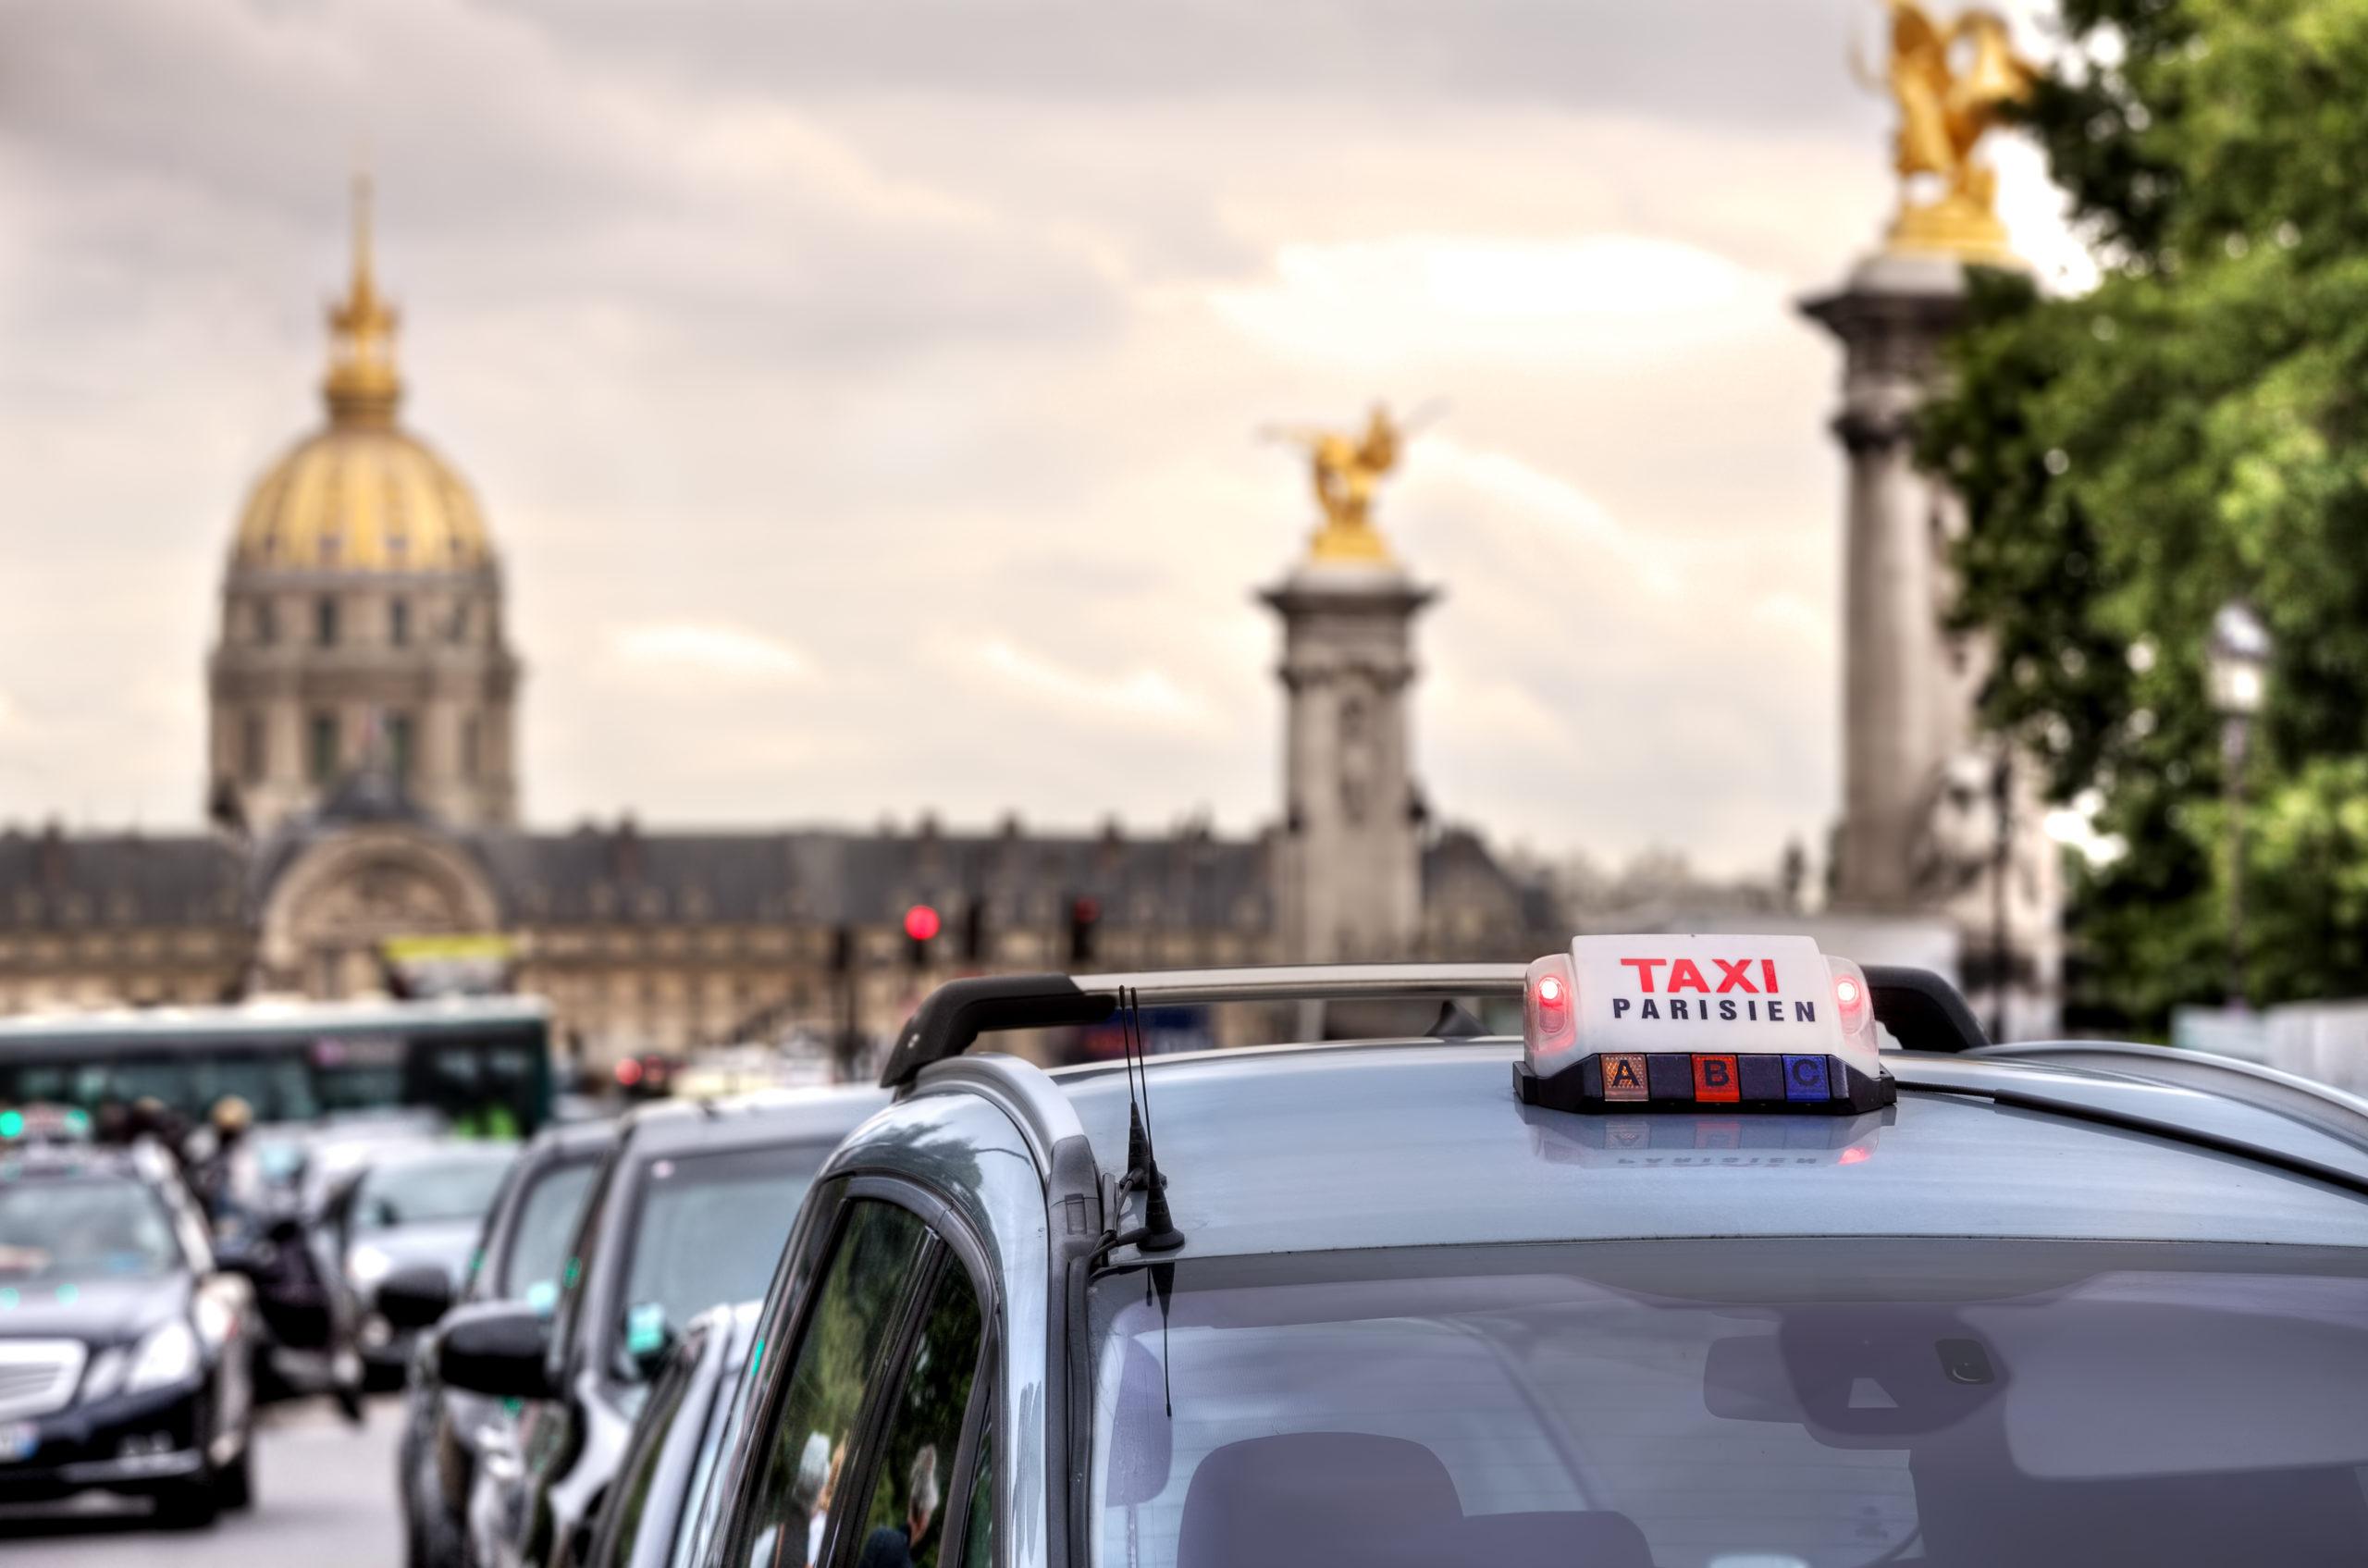 taxi paris